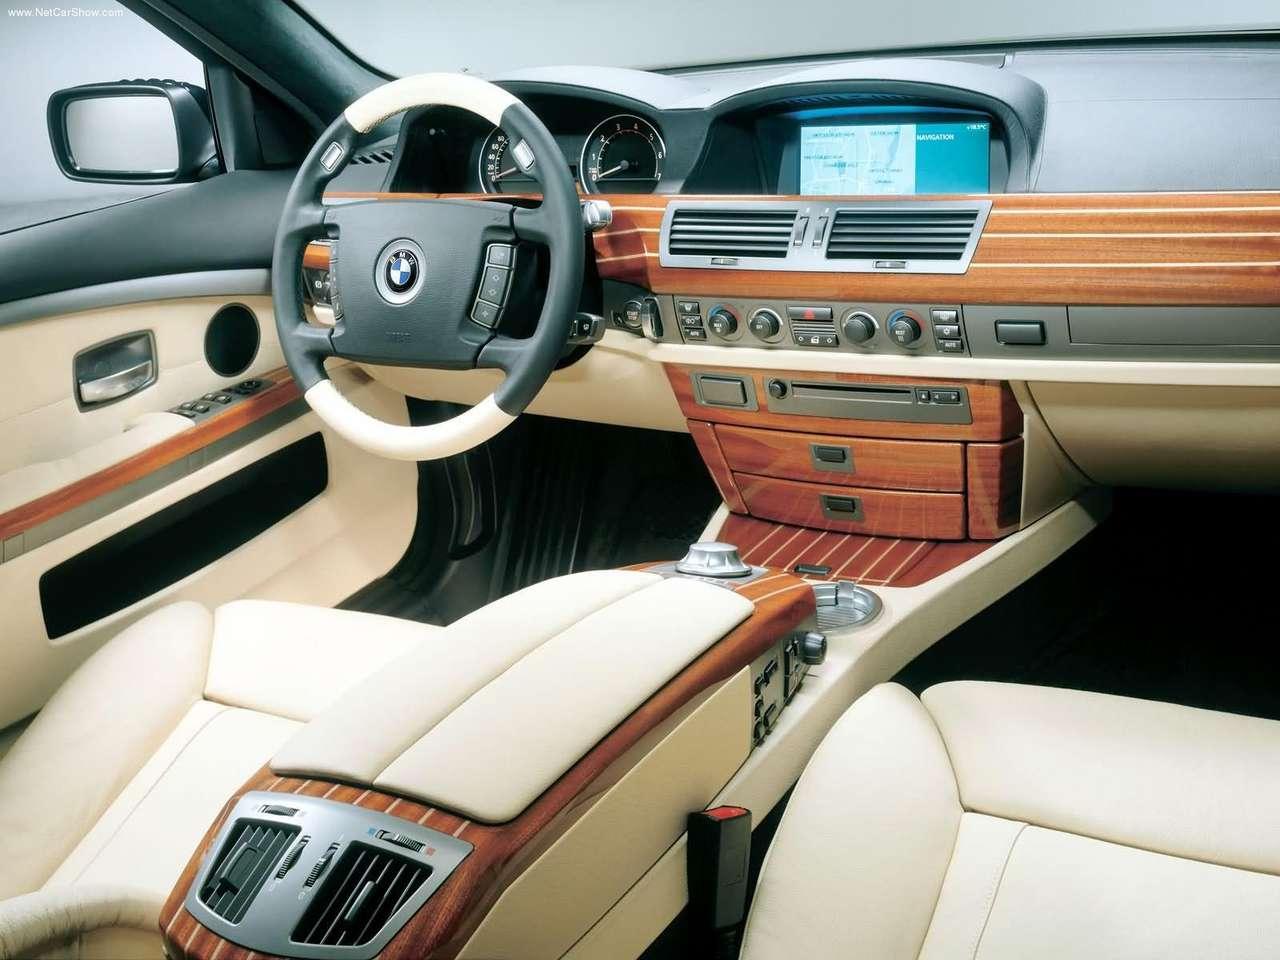 http://1.bp.blogspot.com/_xhqjRo6NERQ/S68c_D9bZgI/AAAAAAAAGZU/aRjh3YUEuRM/s1600/BMW-760Li_Yachtline_Concept_2002_1280x960_wallpaper_03.jpg